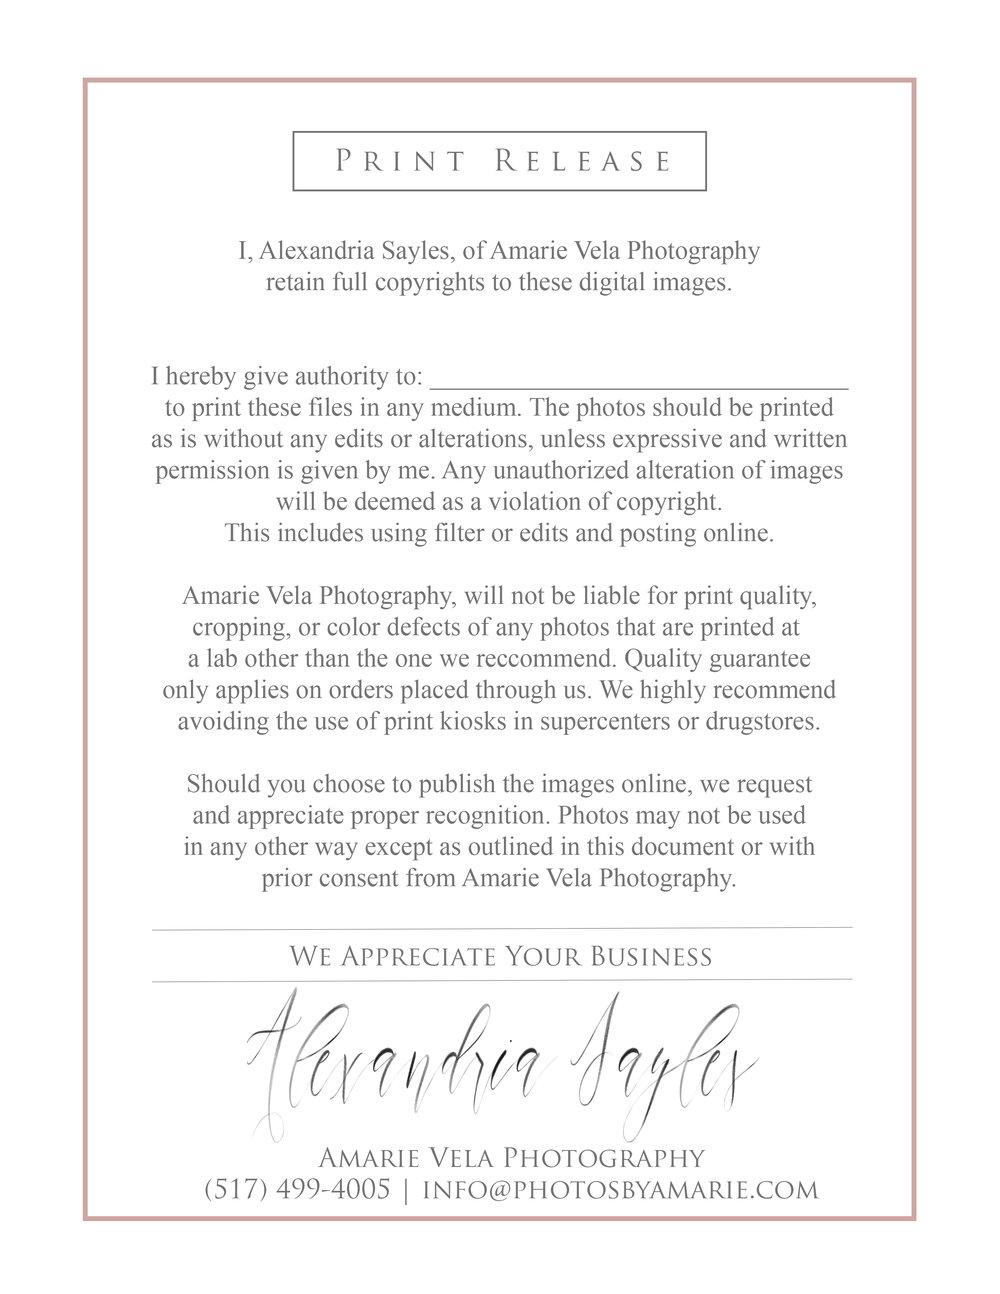 Print Release 2018.jpg